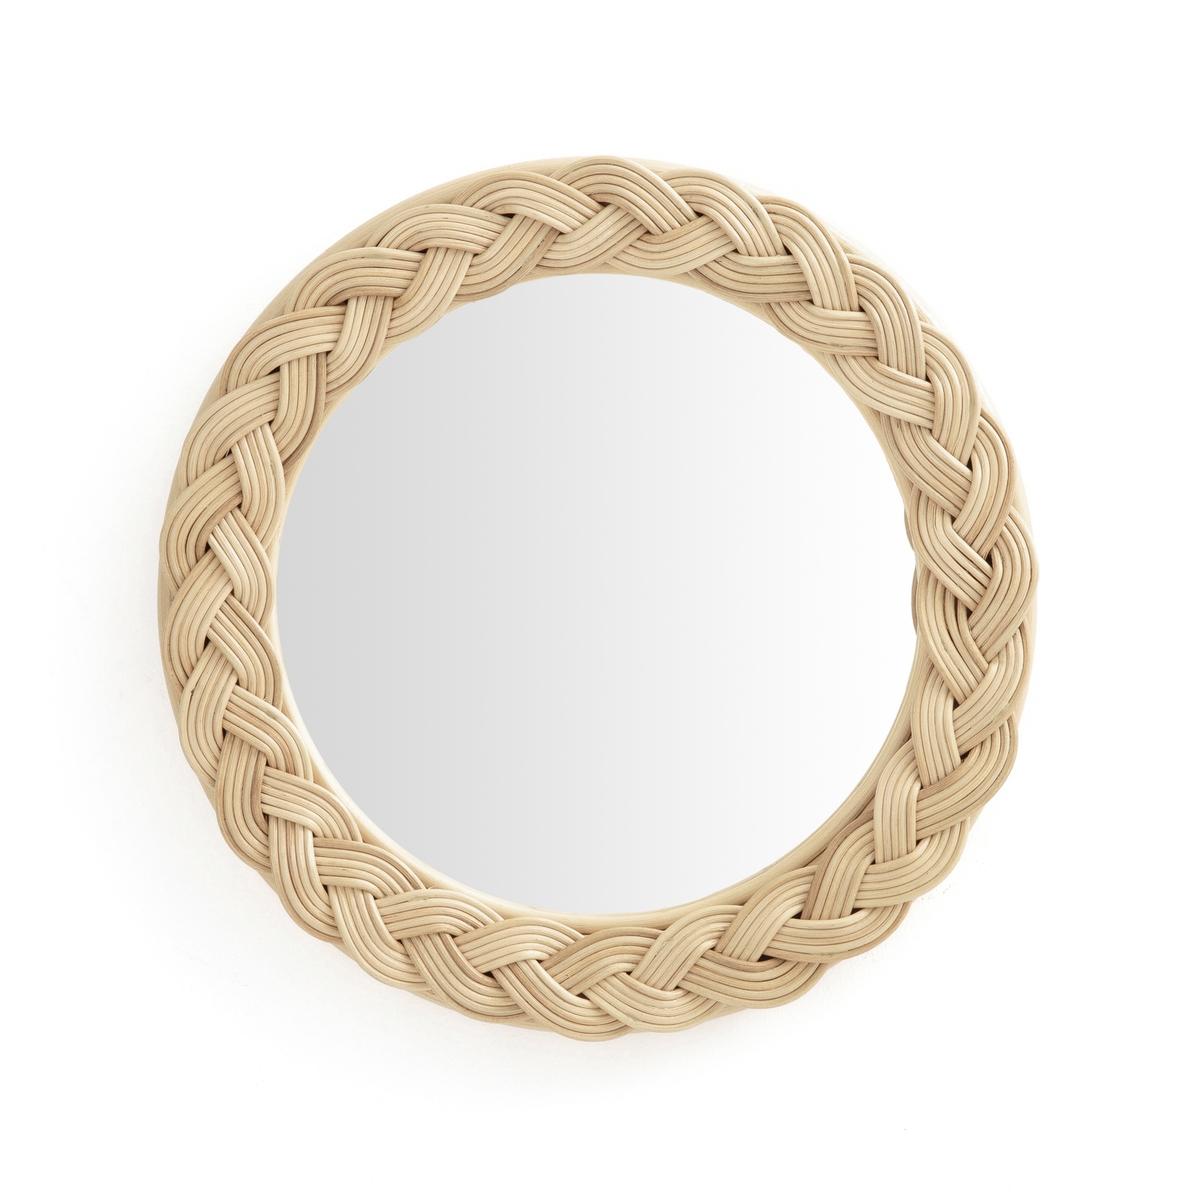 Зеркало круглое с плетеным ротангом, Rybatt зеркало круглое ø60 см